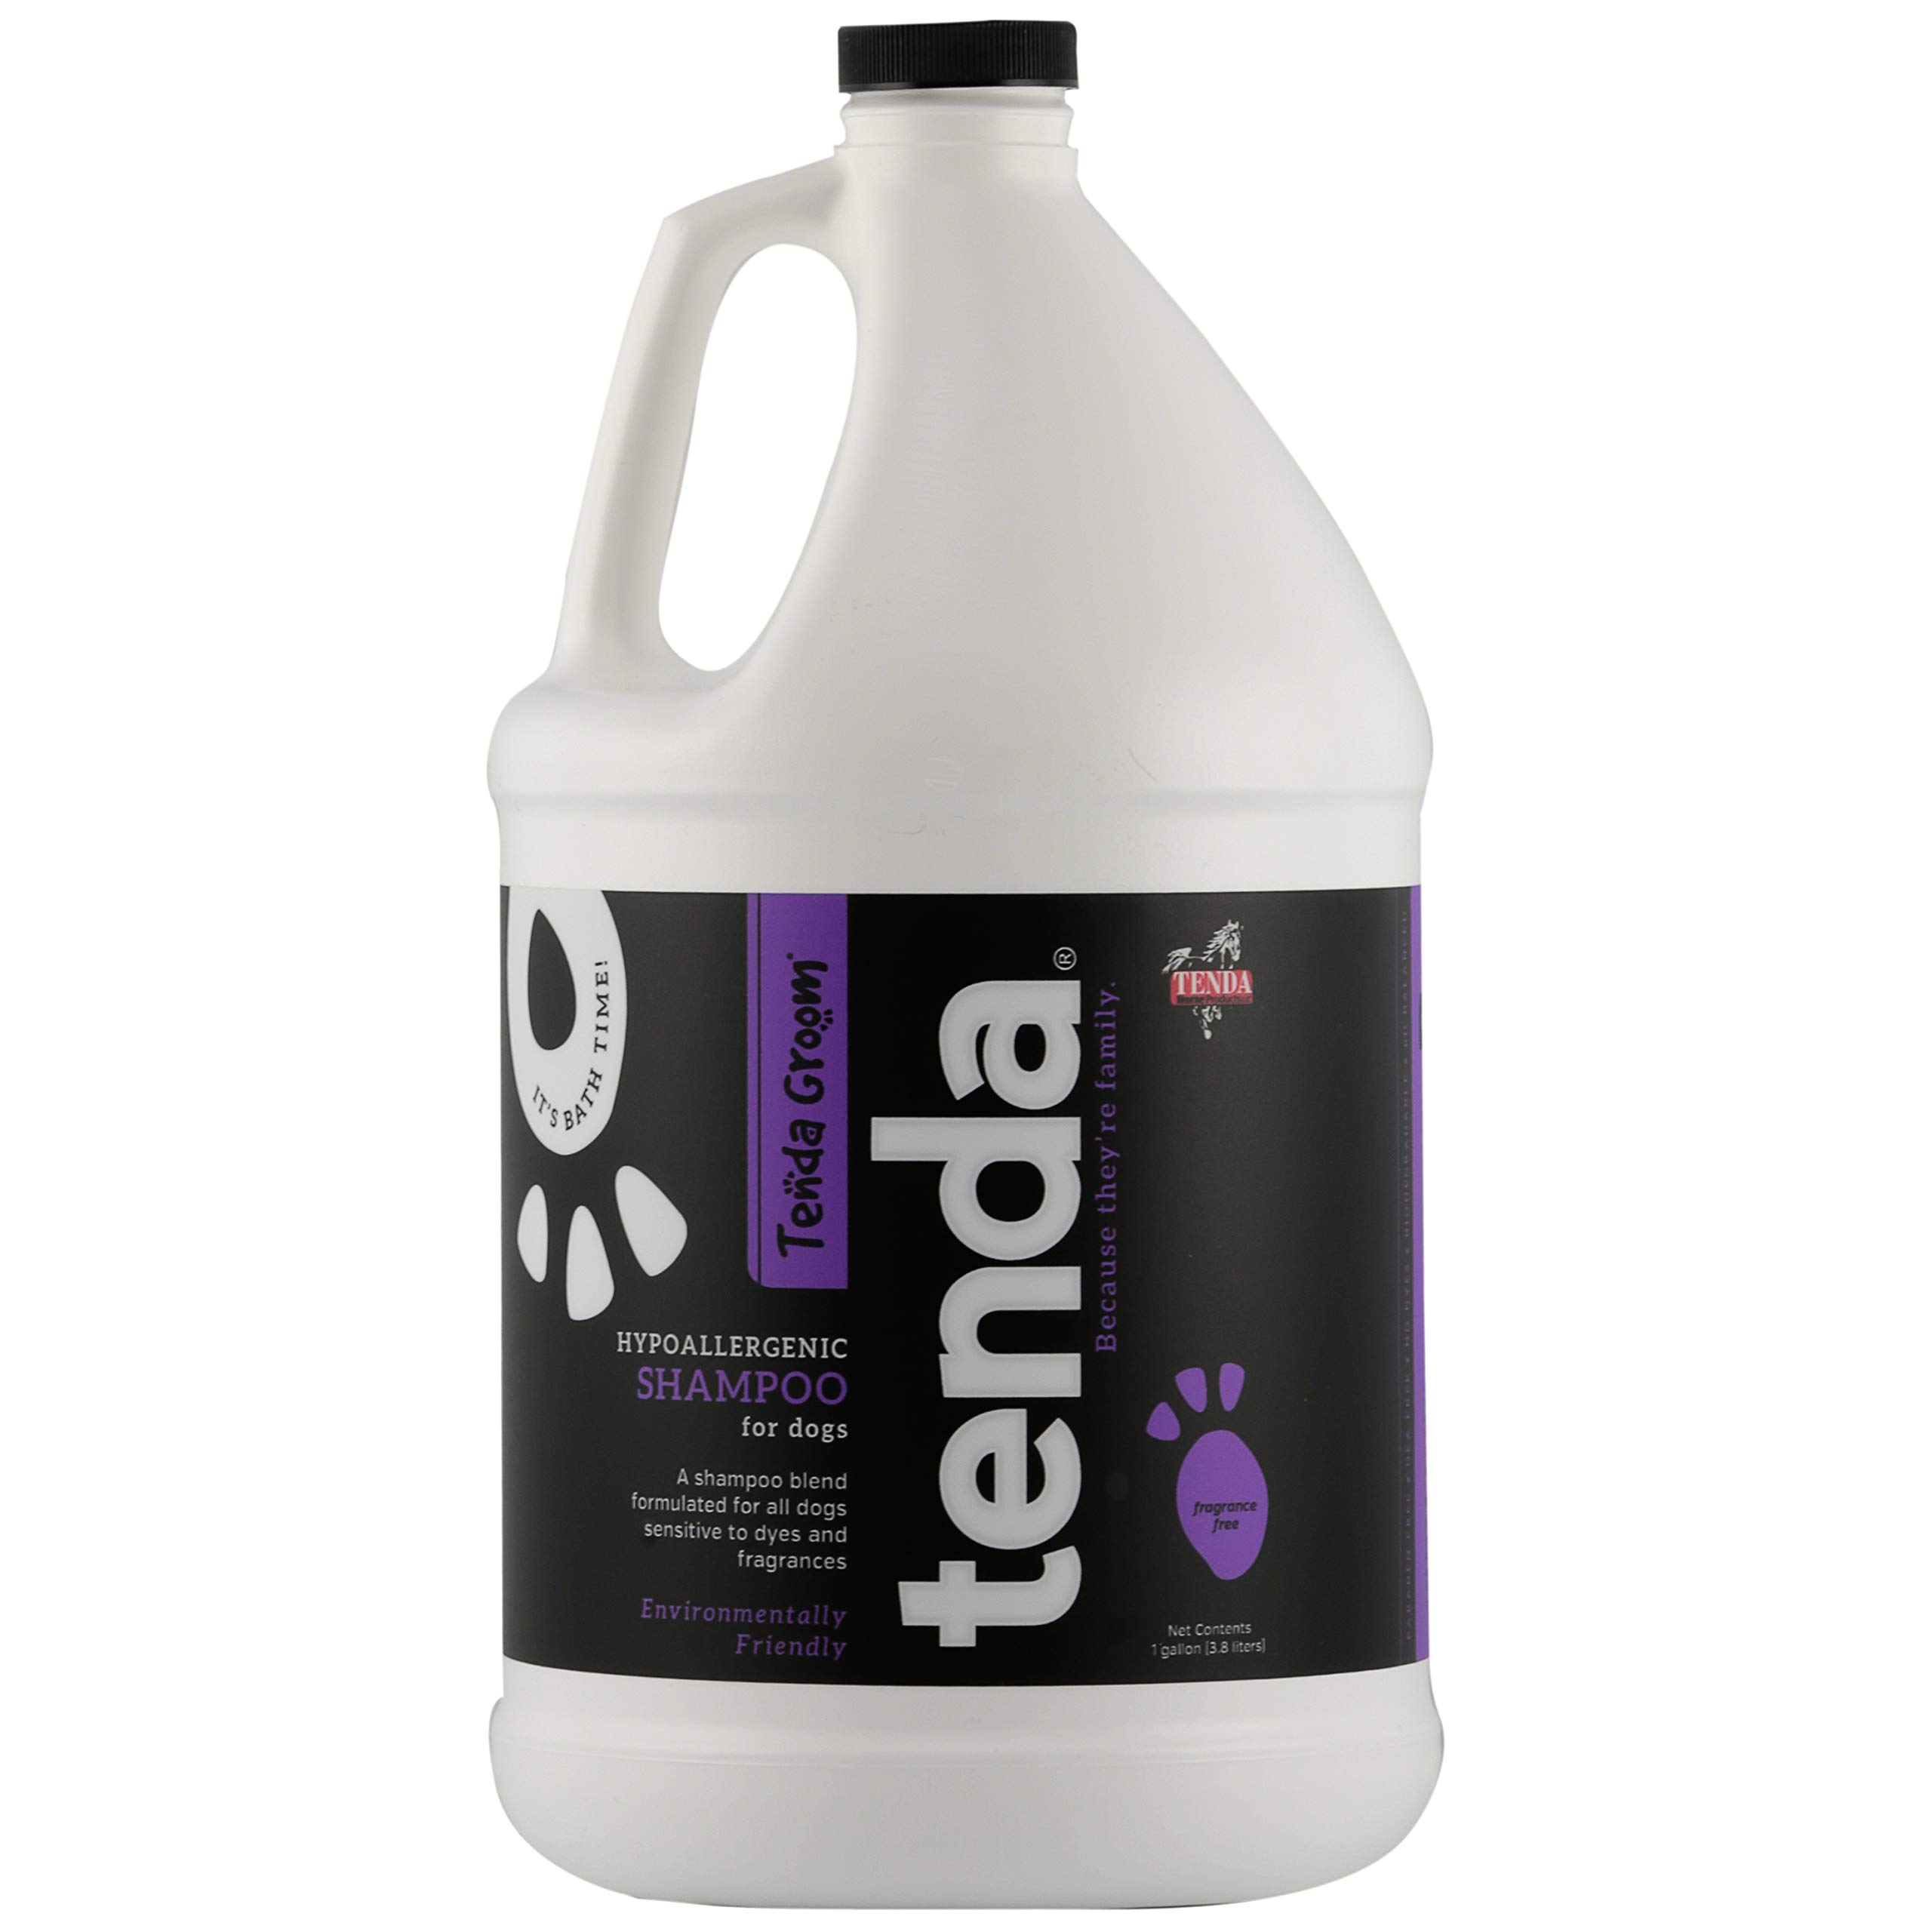 Tenda Groom Hypoallergenic Dog Shampoo, Gallon by Tenda Groom